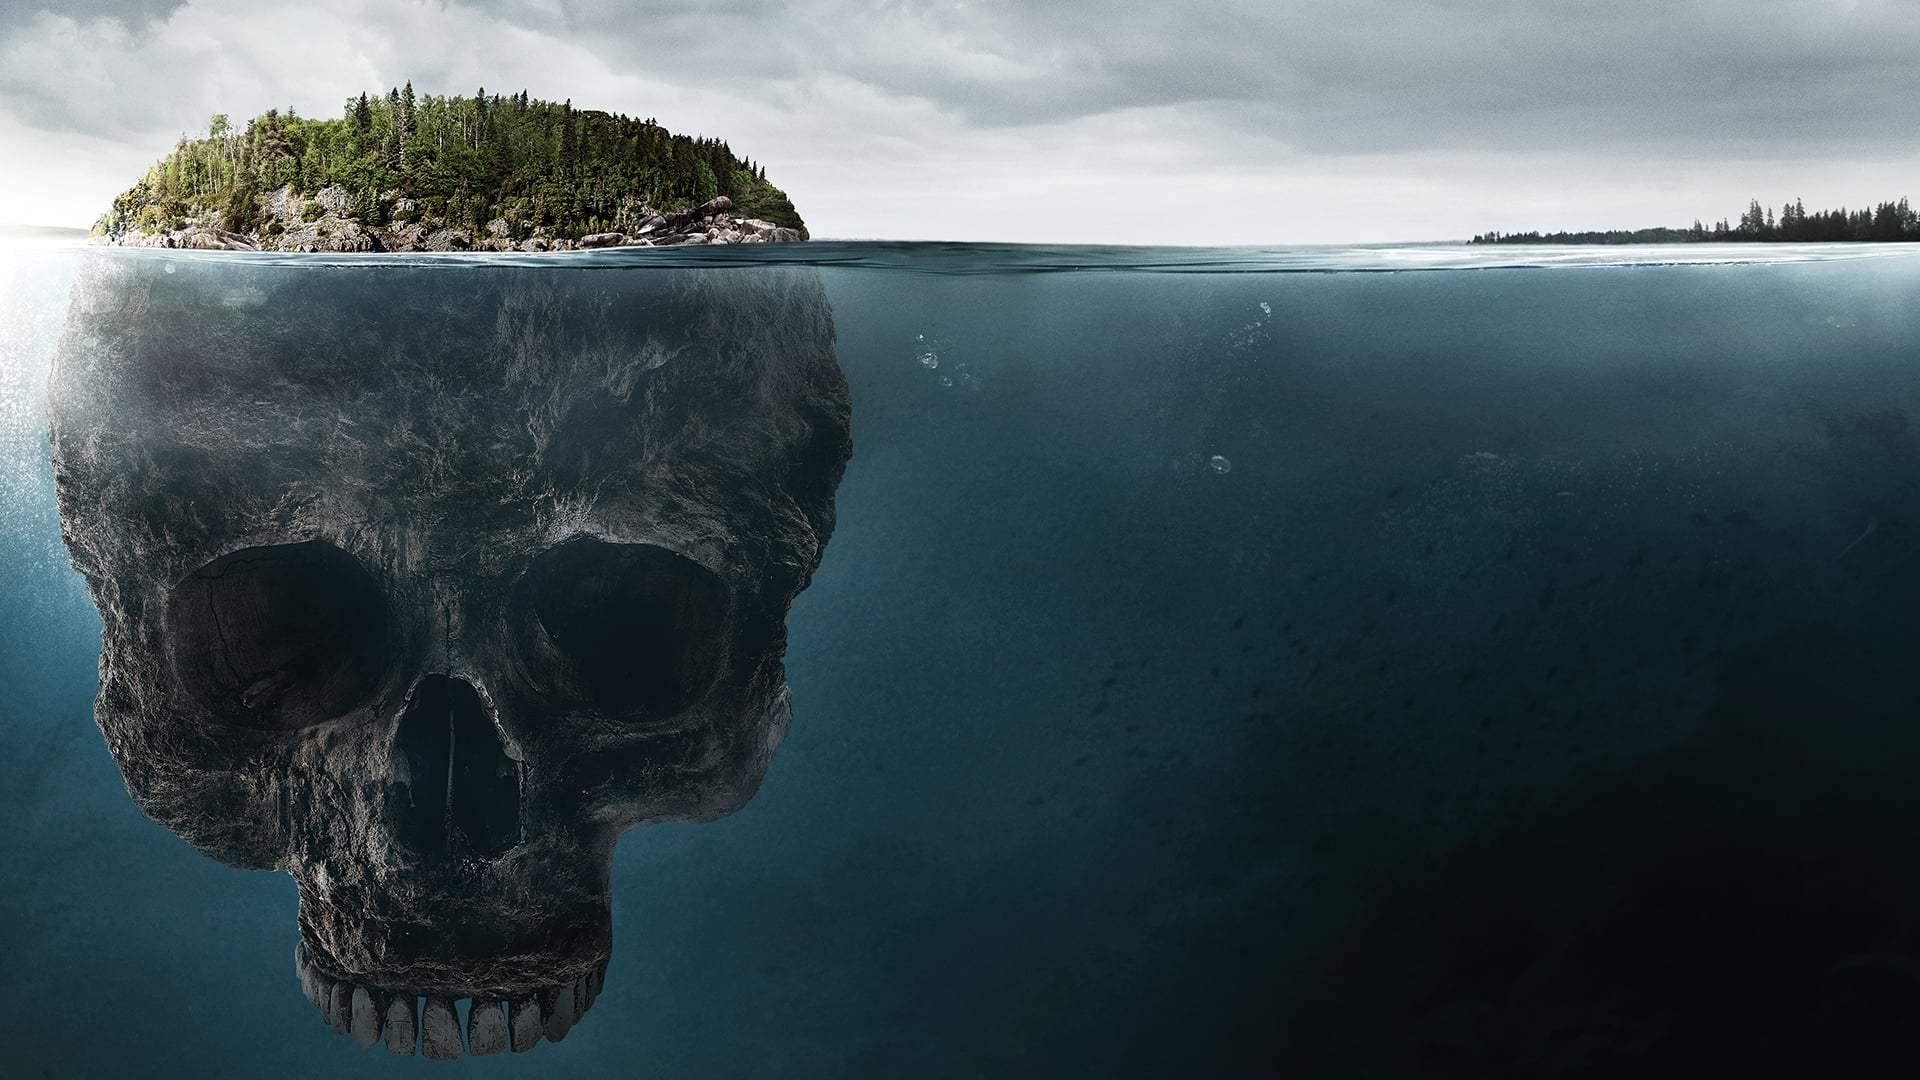 720p~ The Curse of Oak Island Season 8 Episode 10